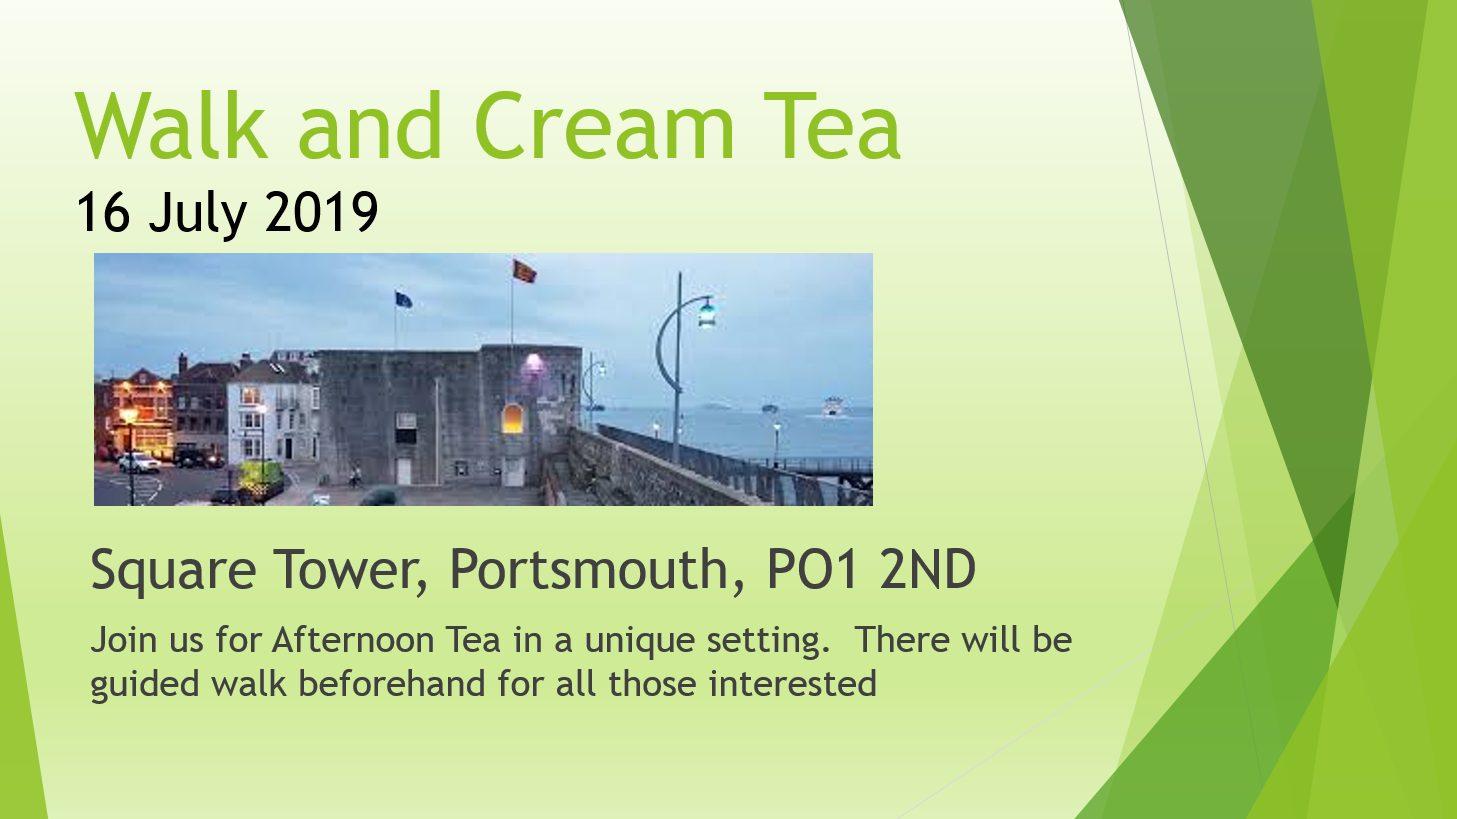 Walk and Cream Tea